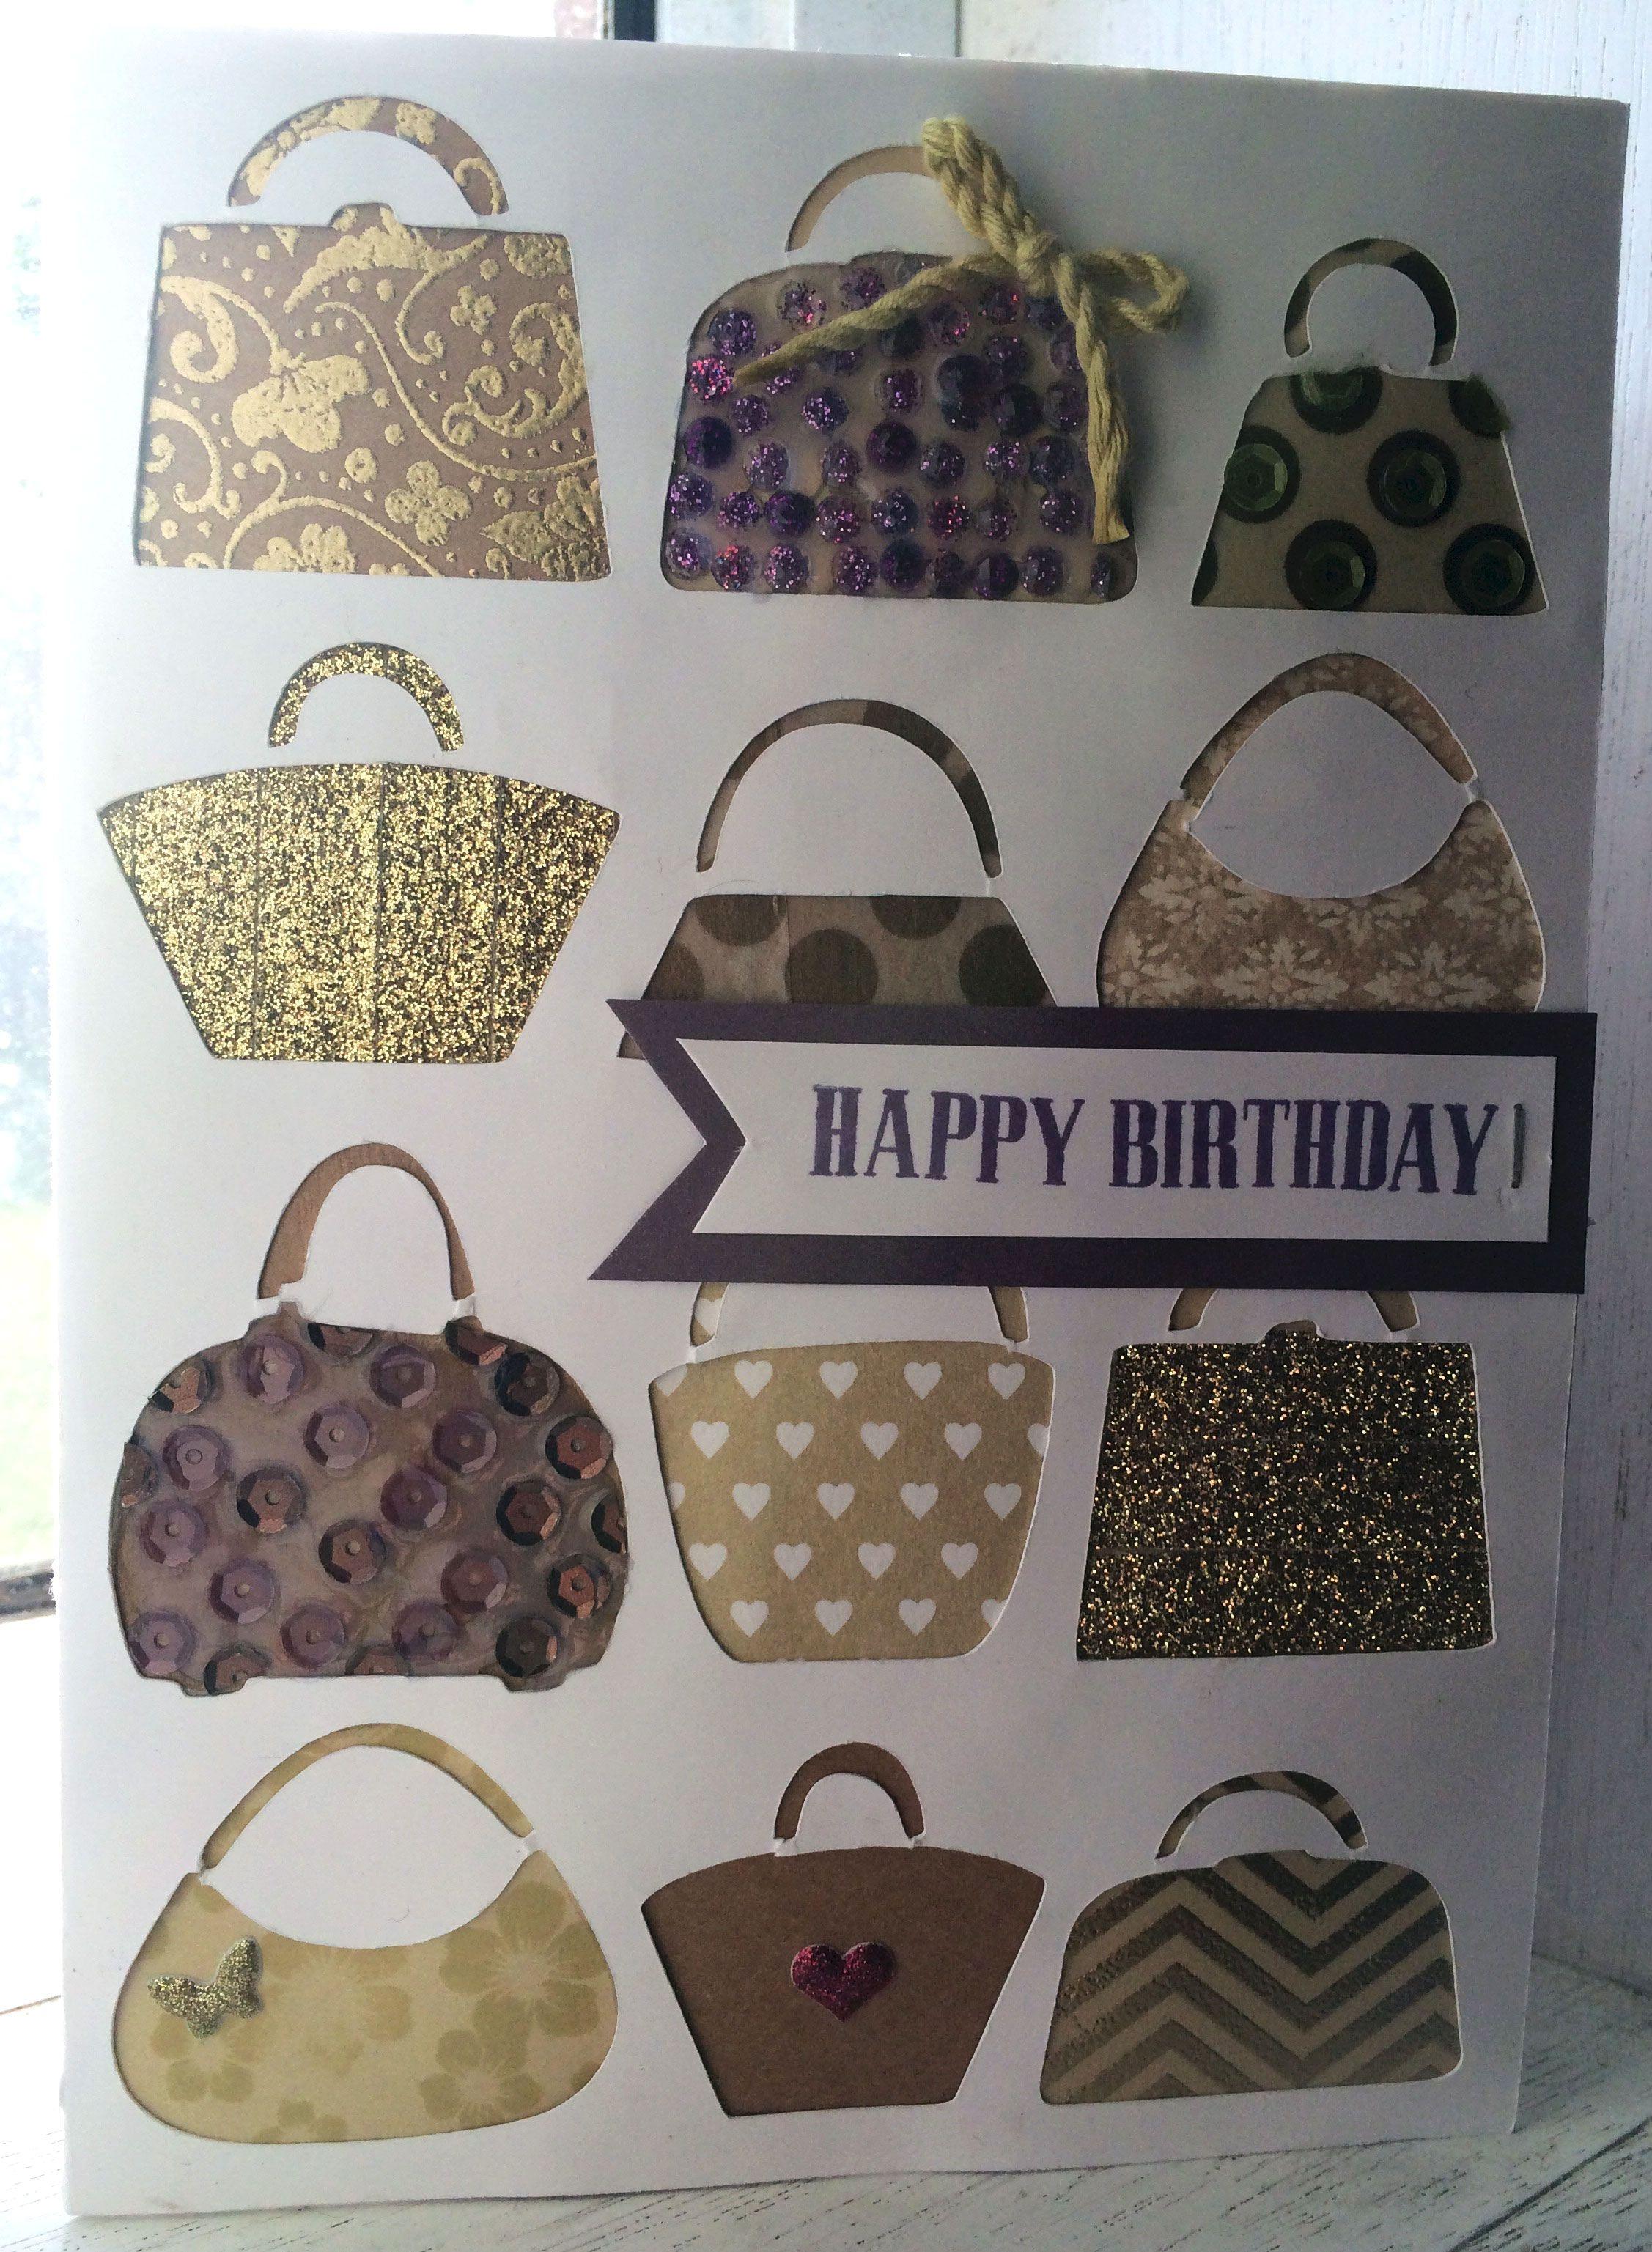 Ctmh handbags birthday handmade card using close to my heart ctmh handbags birthday handmade card using close to my heart exclusive cricut artfully bookmarktalkfo Image collections